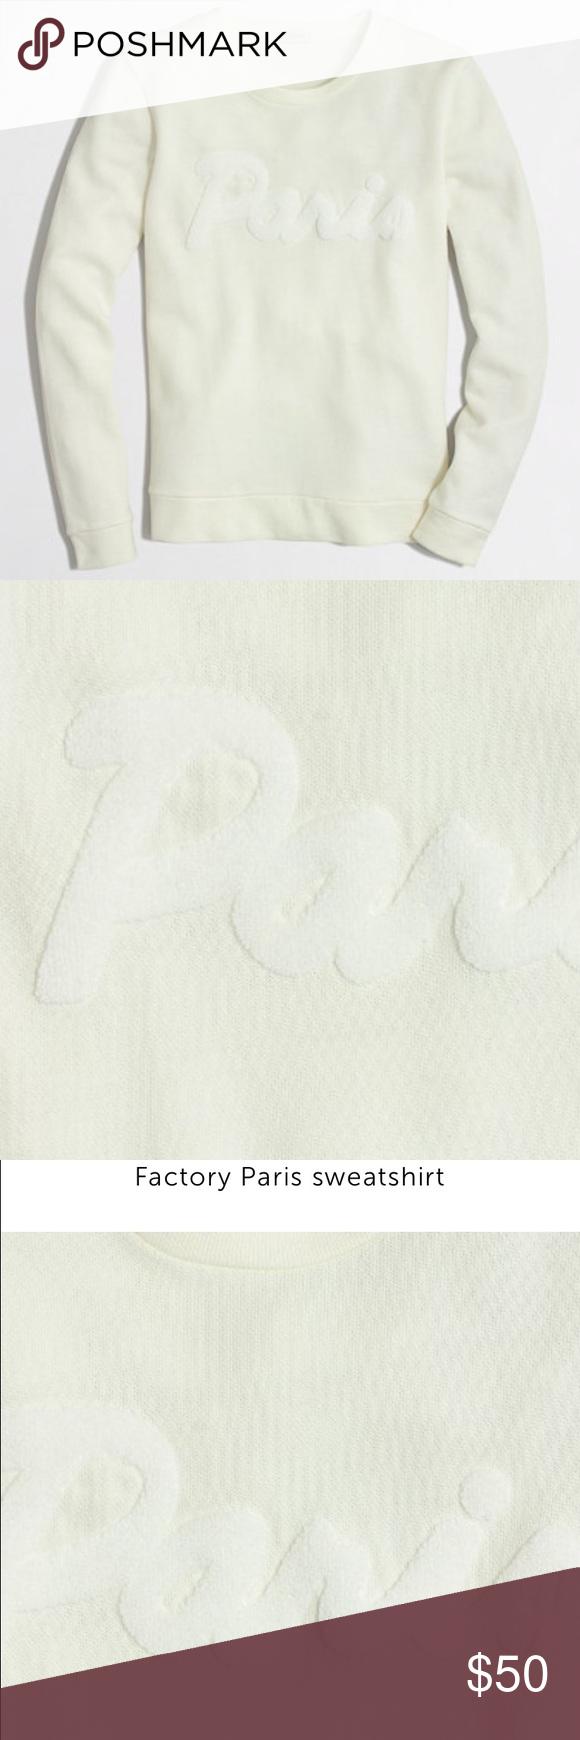 J. Crew white XXS crew neck Paris sweatshirt J. Crew white crew neck long sleeve cotton Paris sweatshirt. Made with soft stretchy cotton. In great condition. J. Crew Sweaters Crew & Scoop Necks